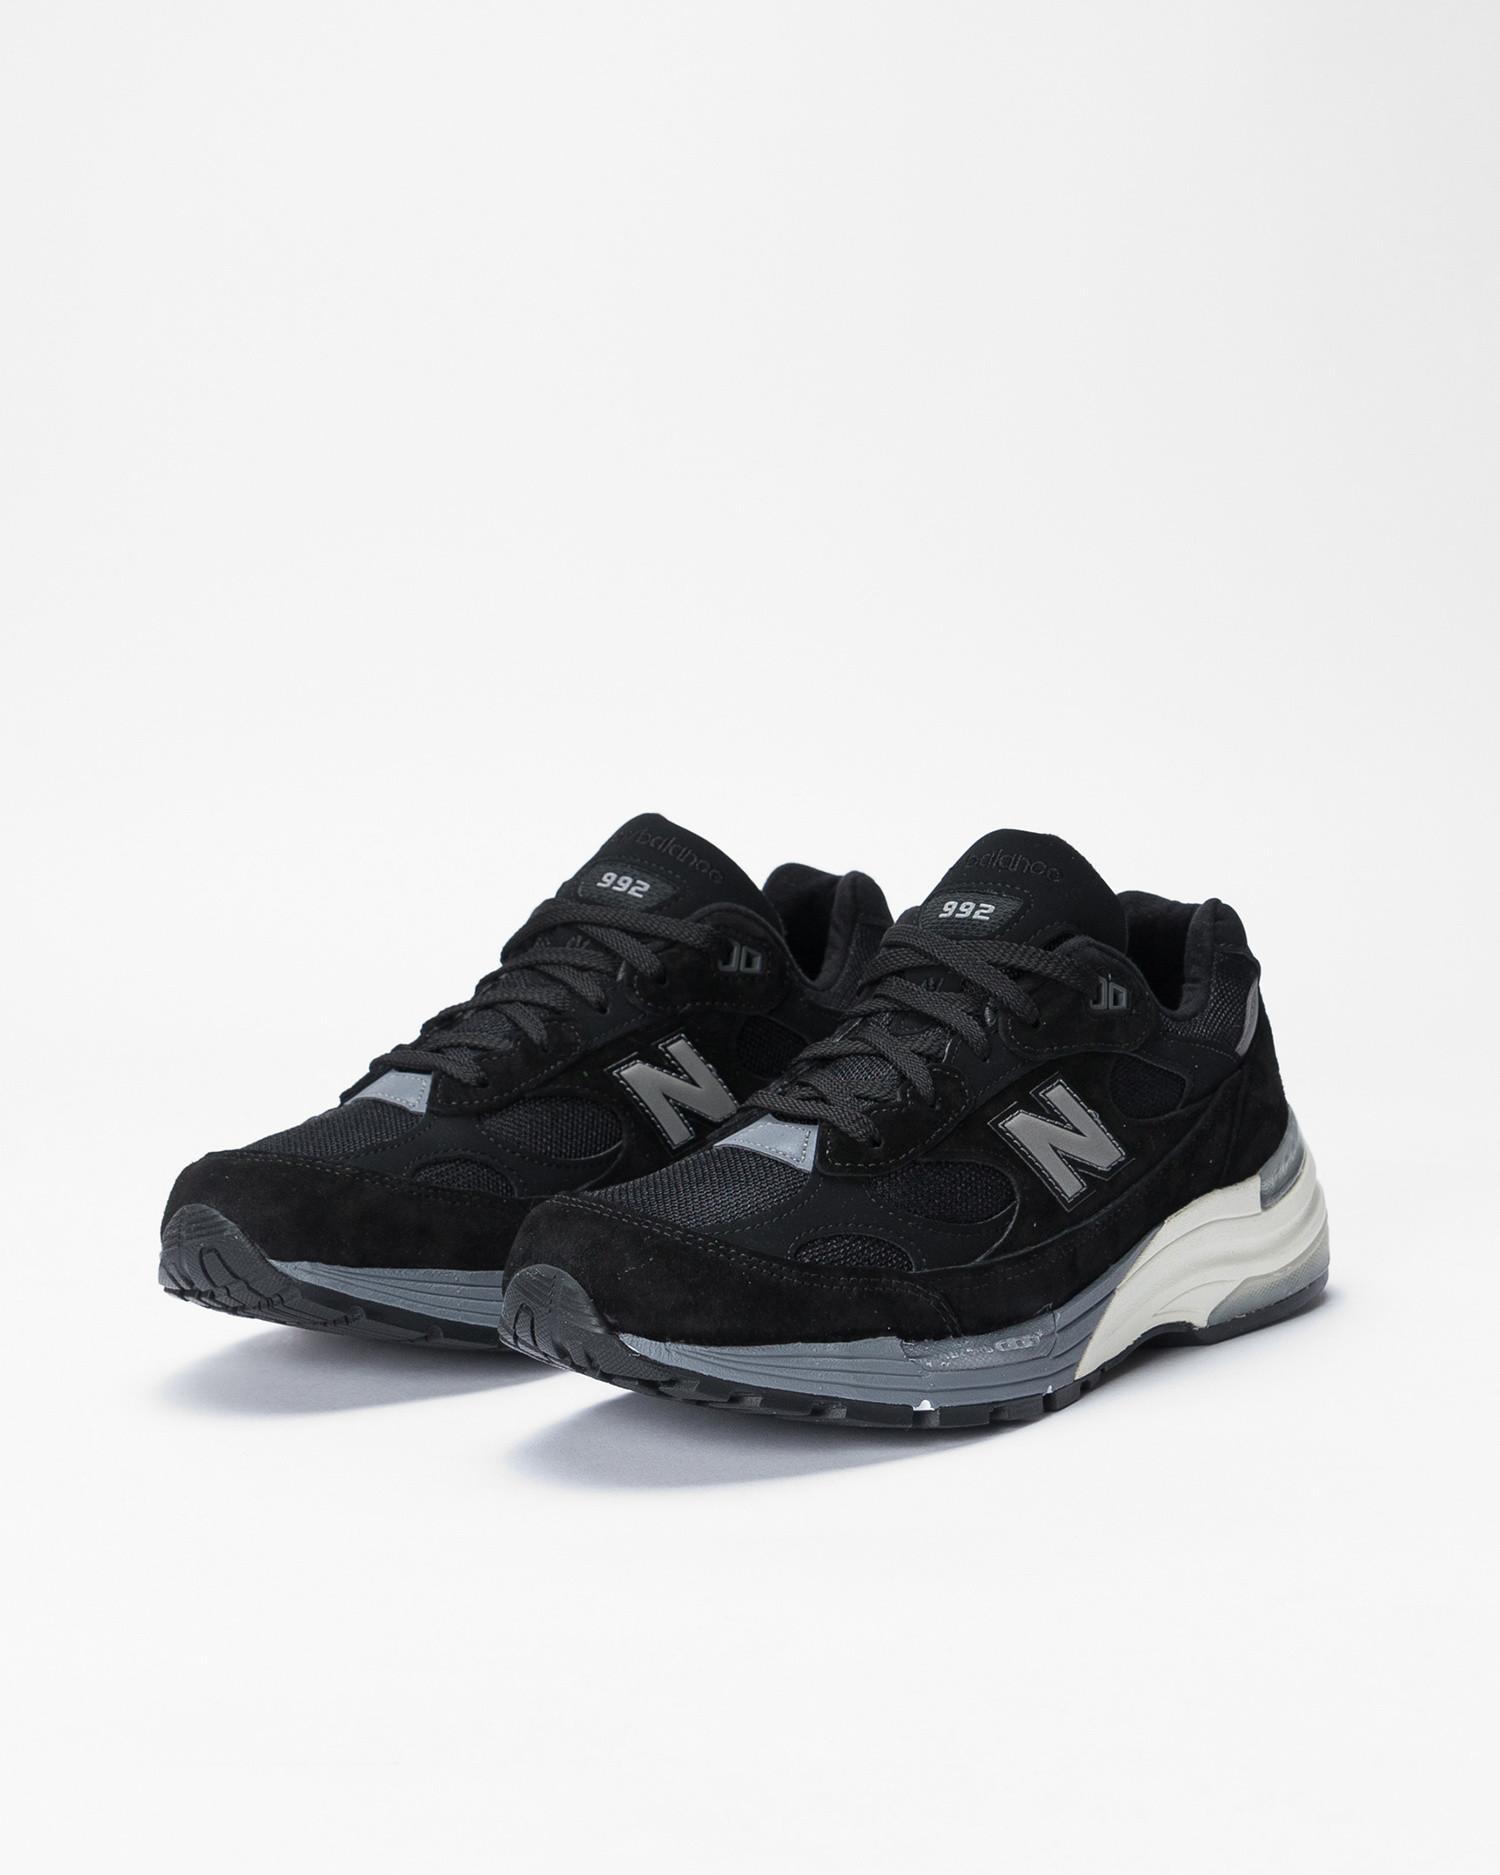 New Balance NM 992 Black/Grey